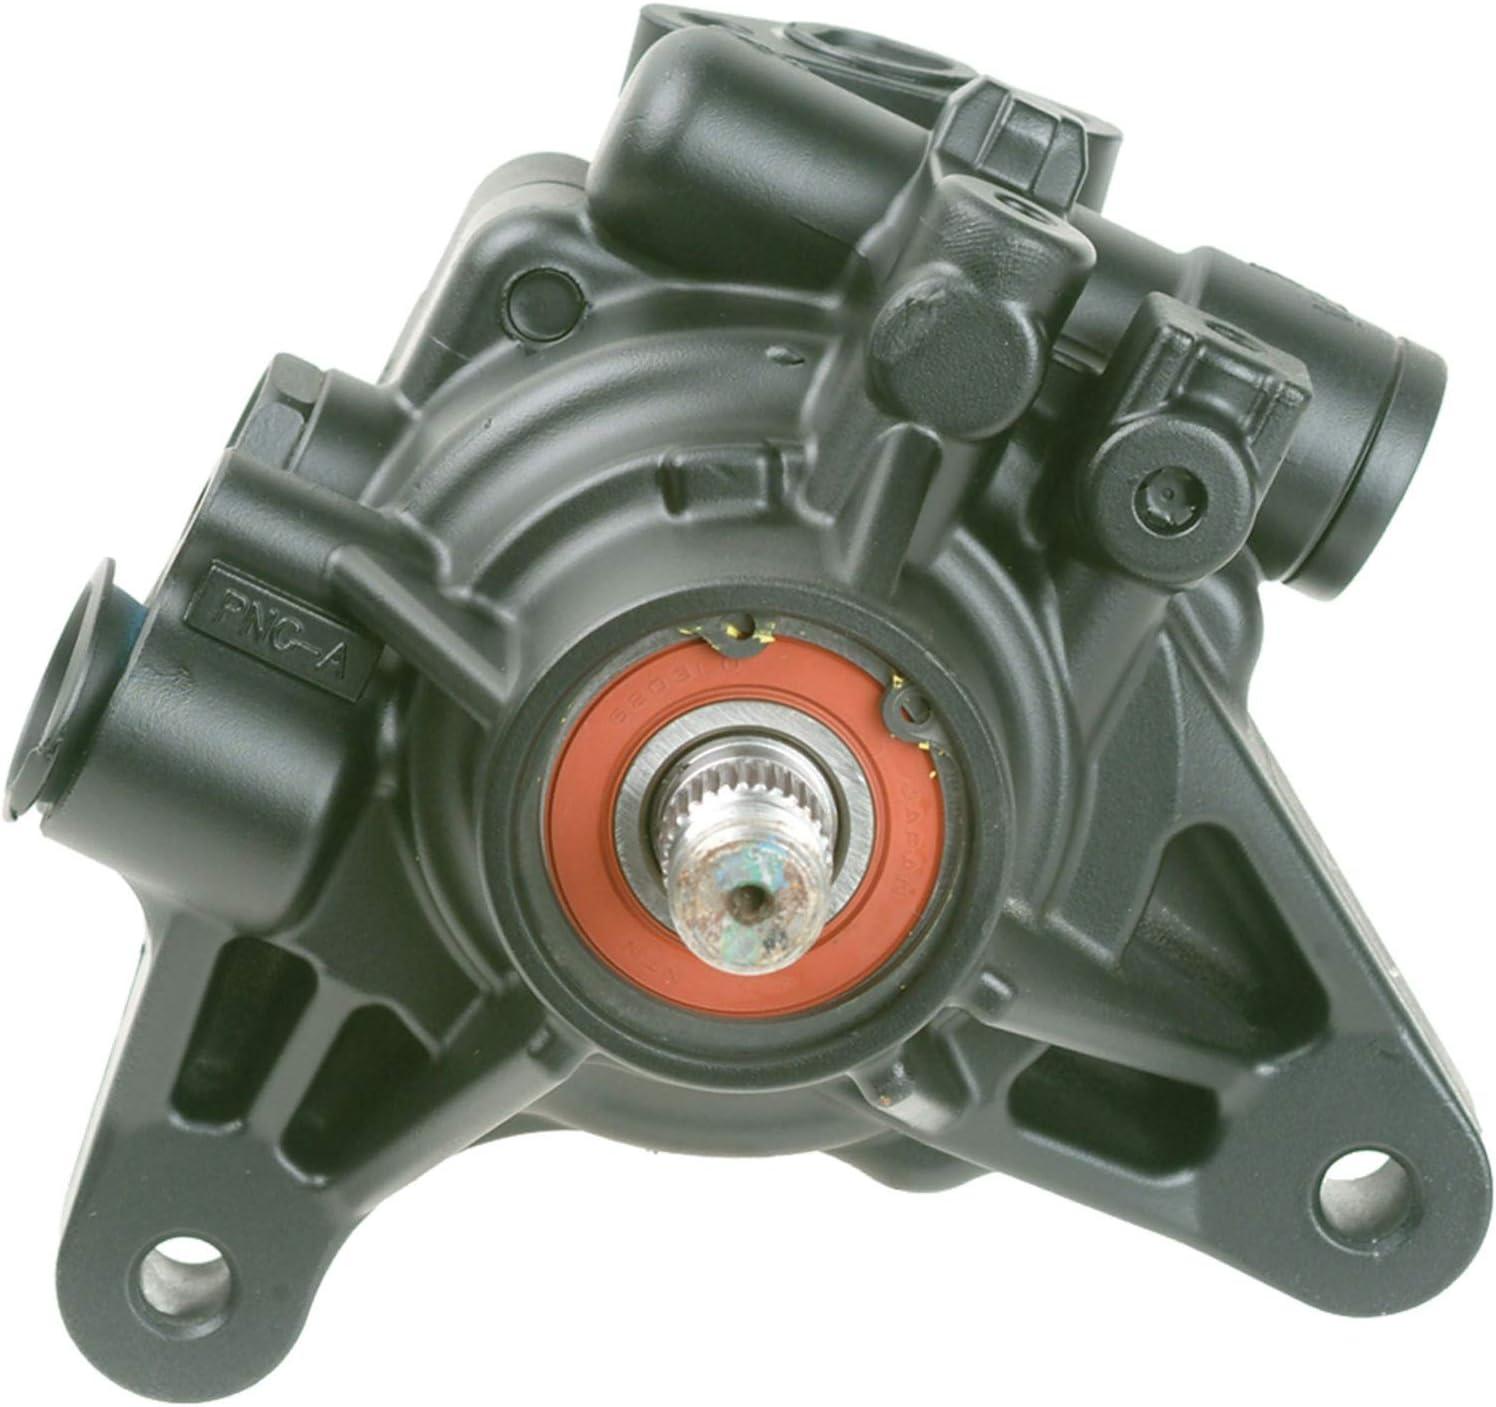 Cardone 21-5484 Remanufactured Import Power Steering Pump